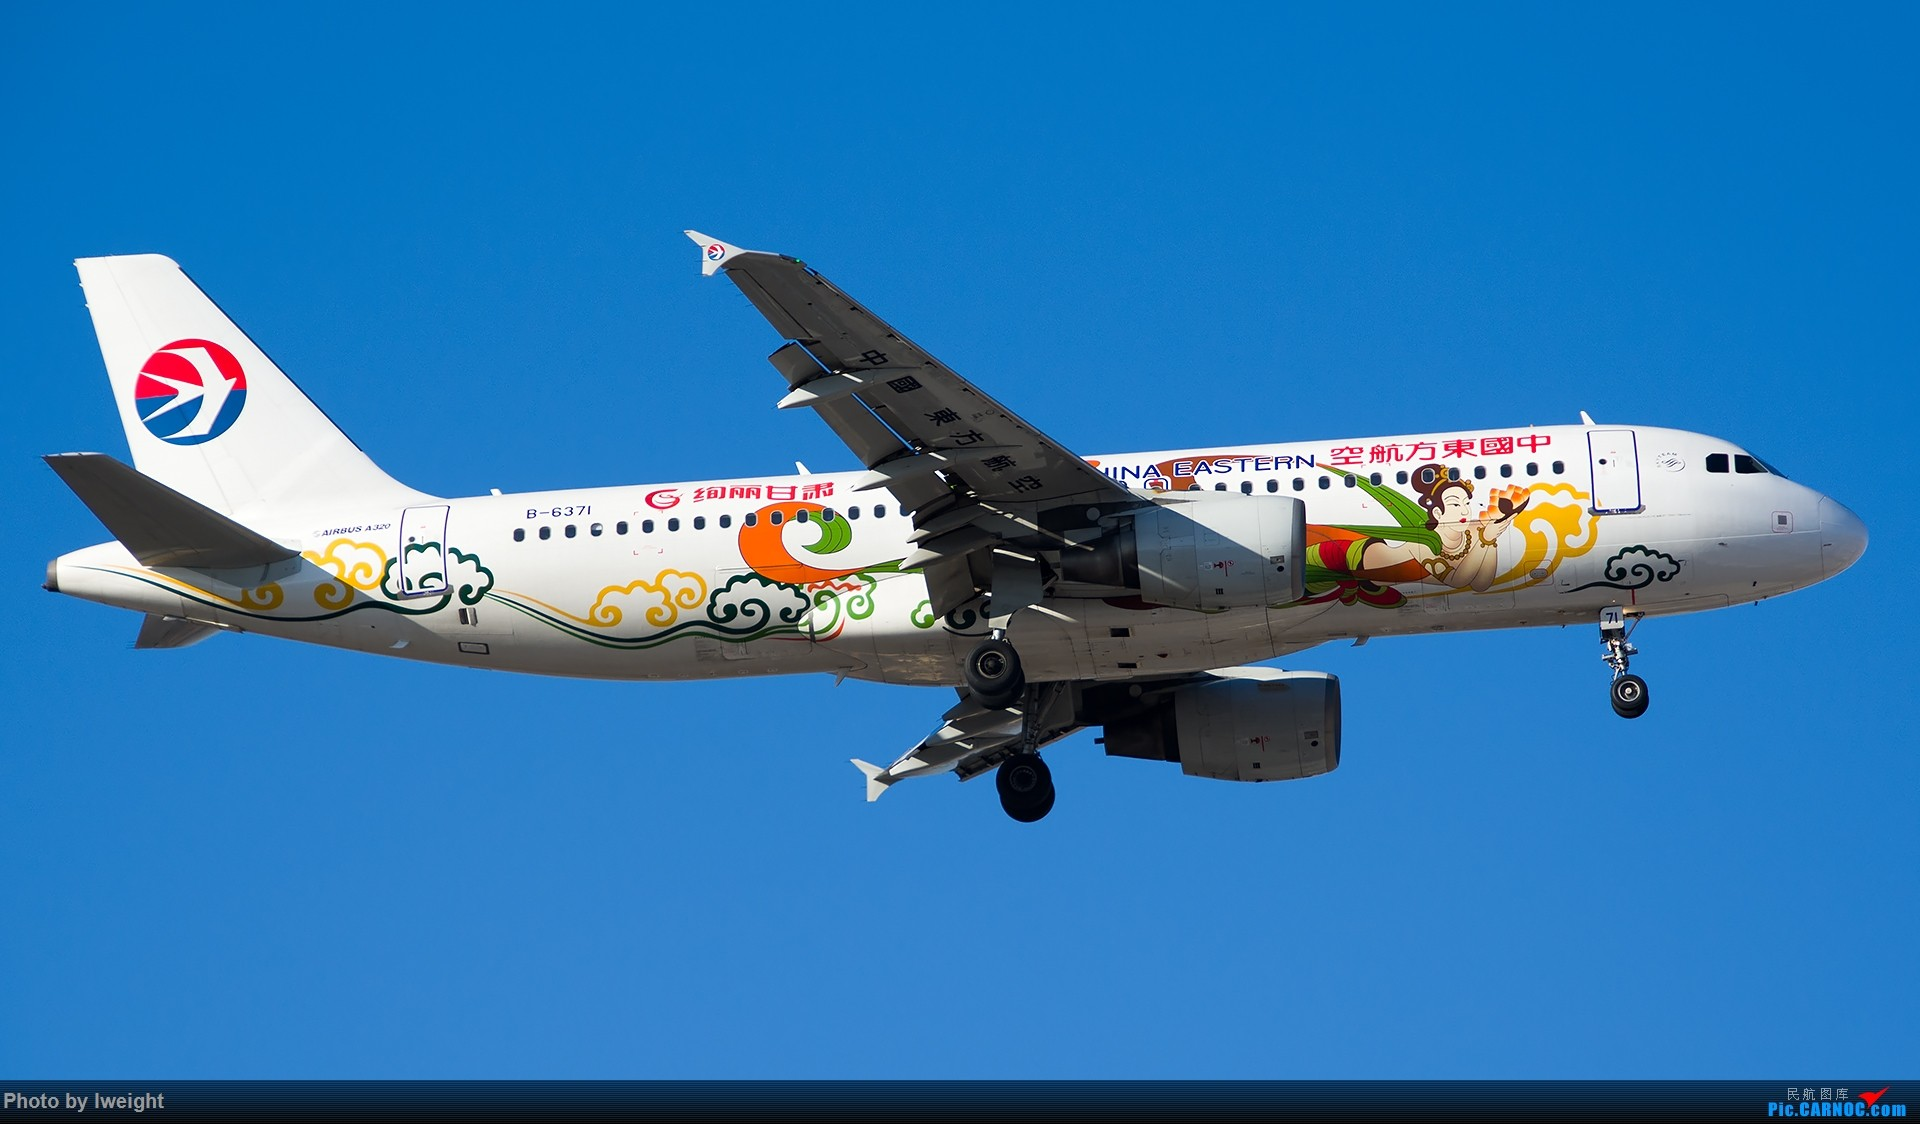 Re:[原创]北京难得的好天气,随手拍了一些渣图【2015-01-27】 AIRBUS A320-200 B-6371 中国北京首都国际机场